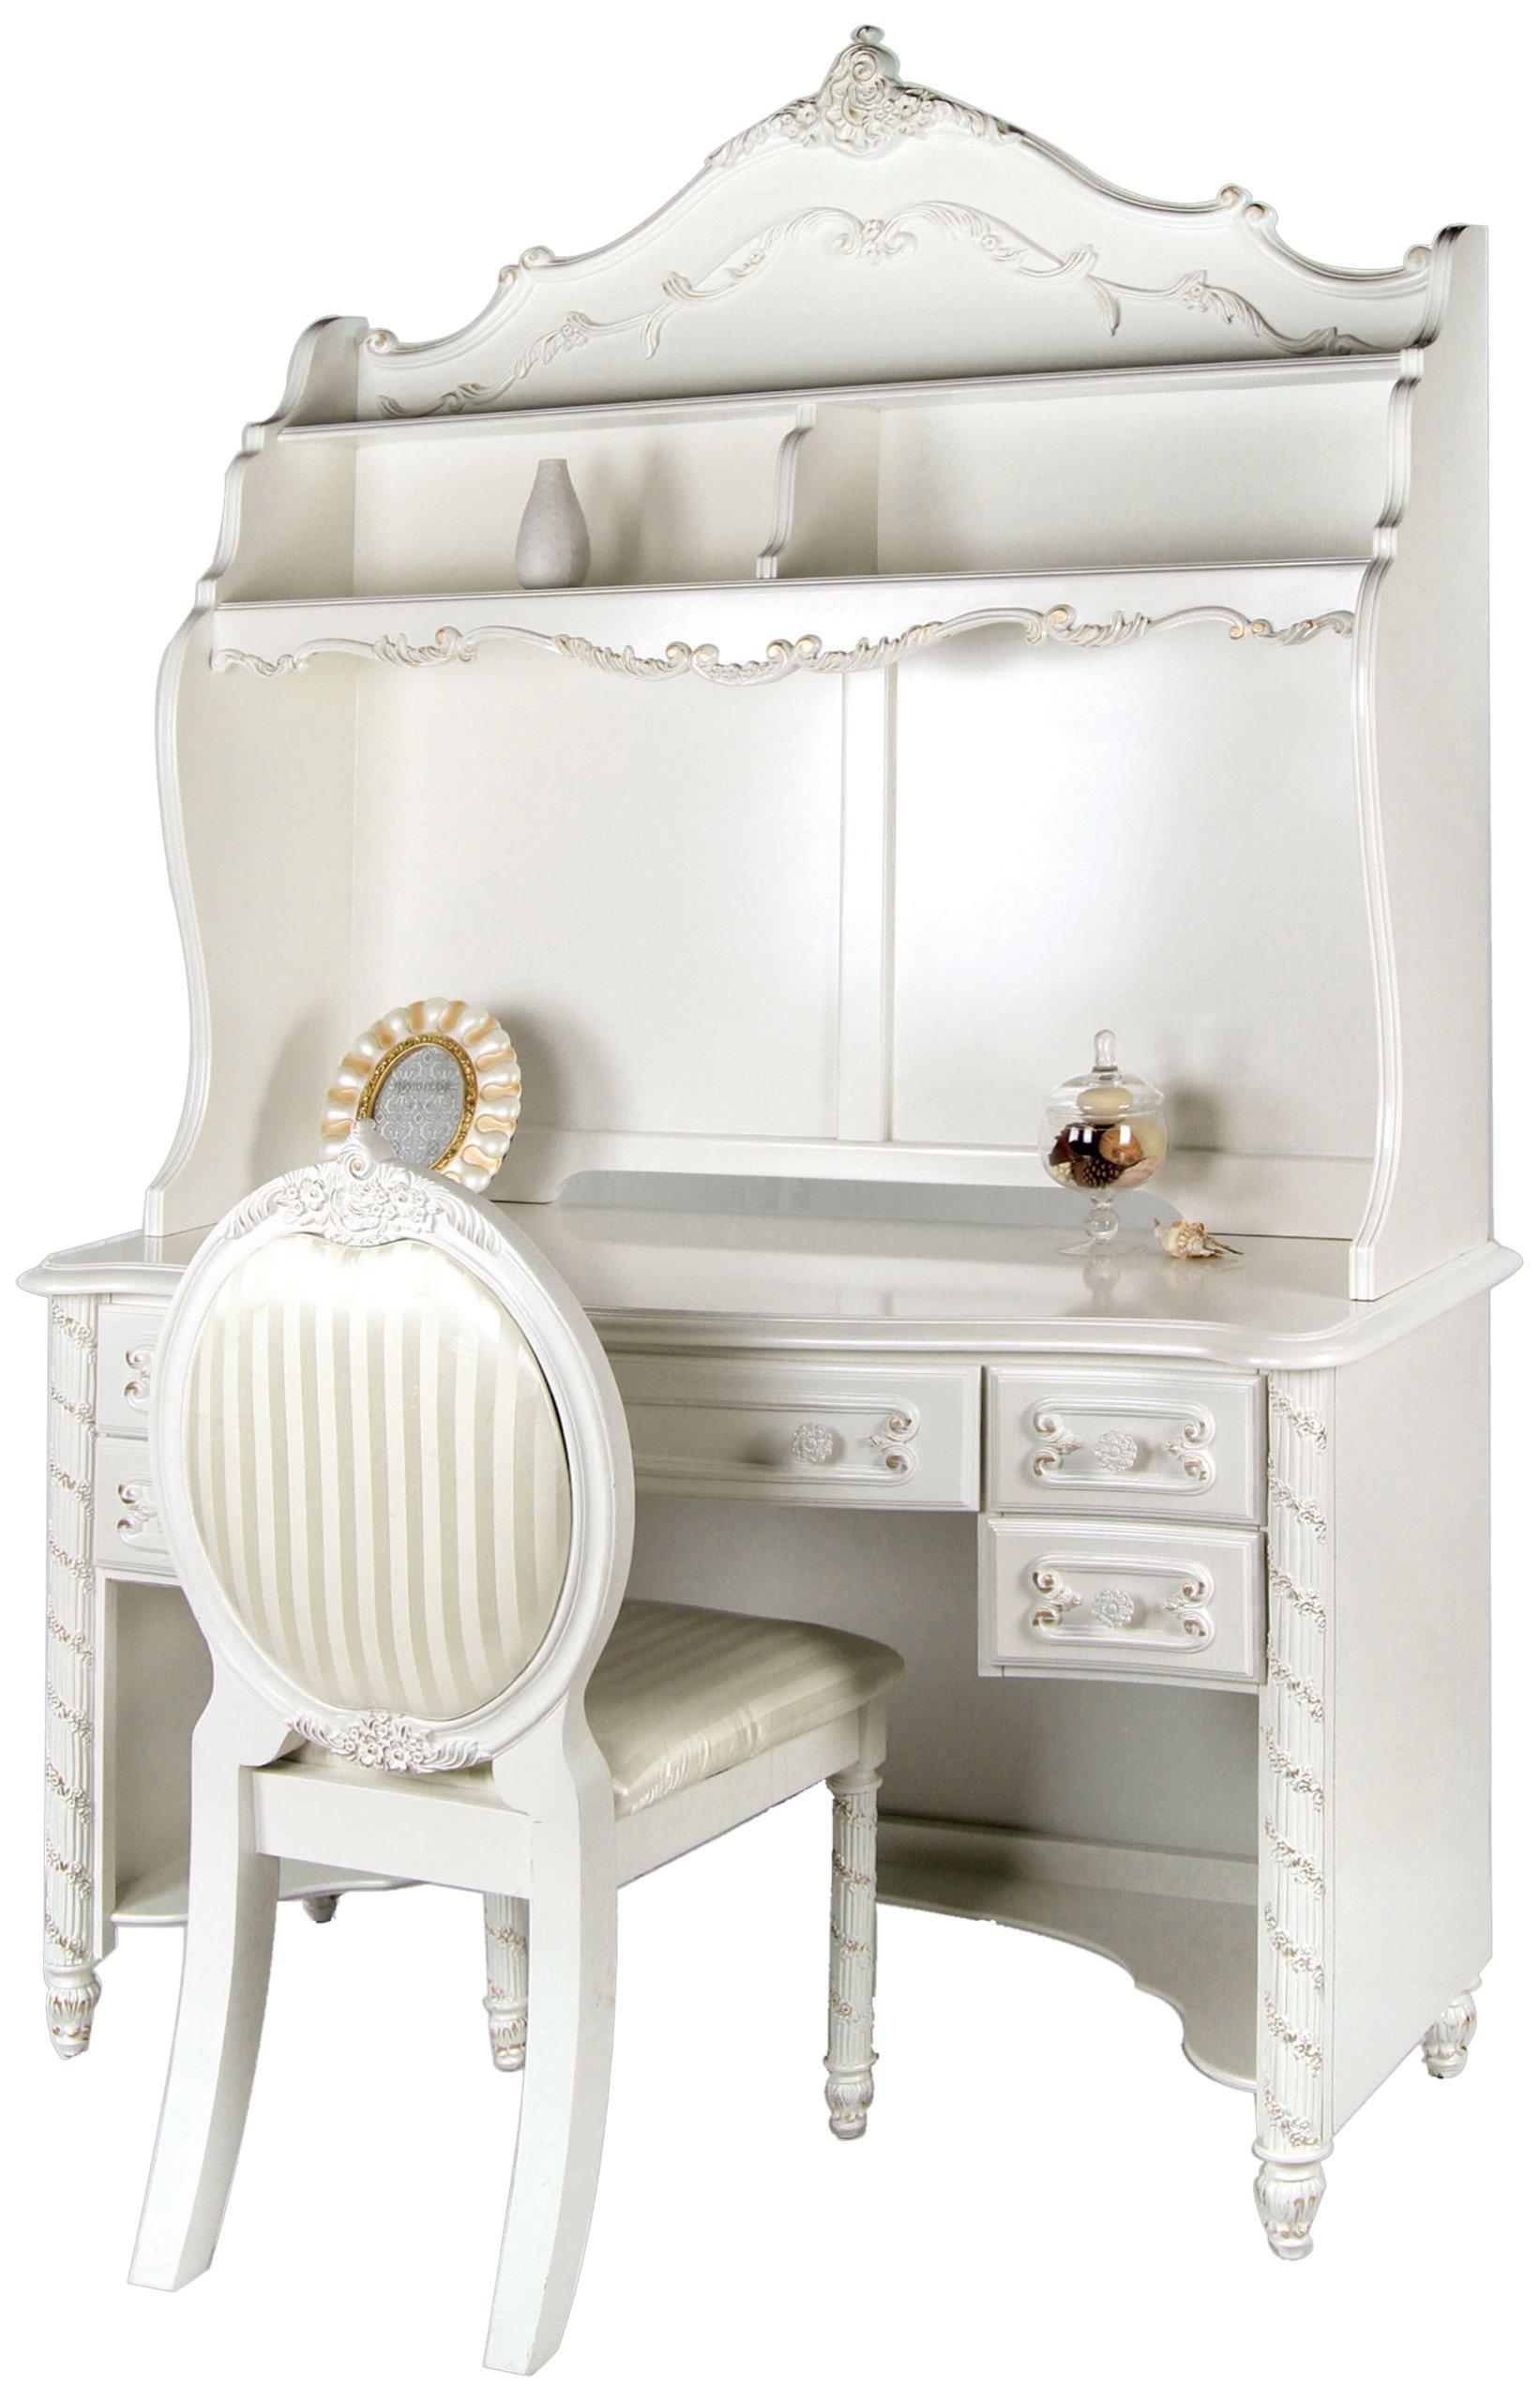 Furniture of America Nathalia Fairy Tale Style 3-Piece Desk Set, Pearl White Finish